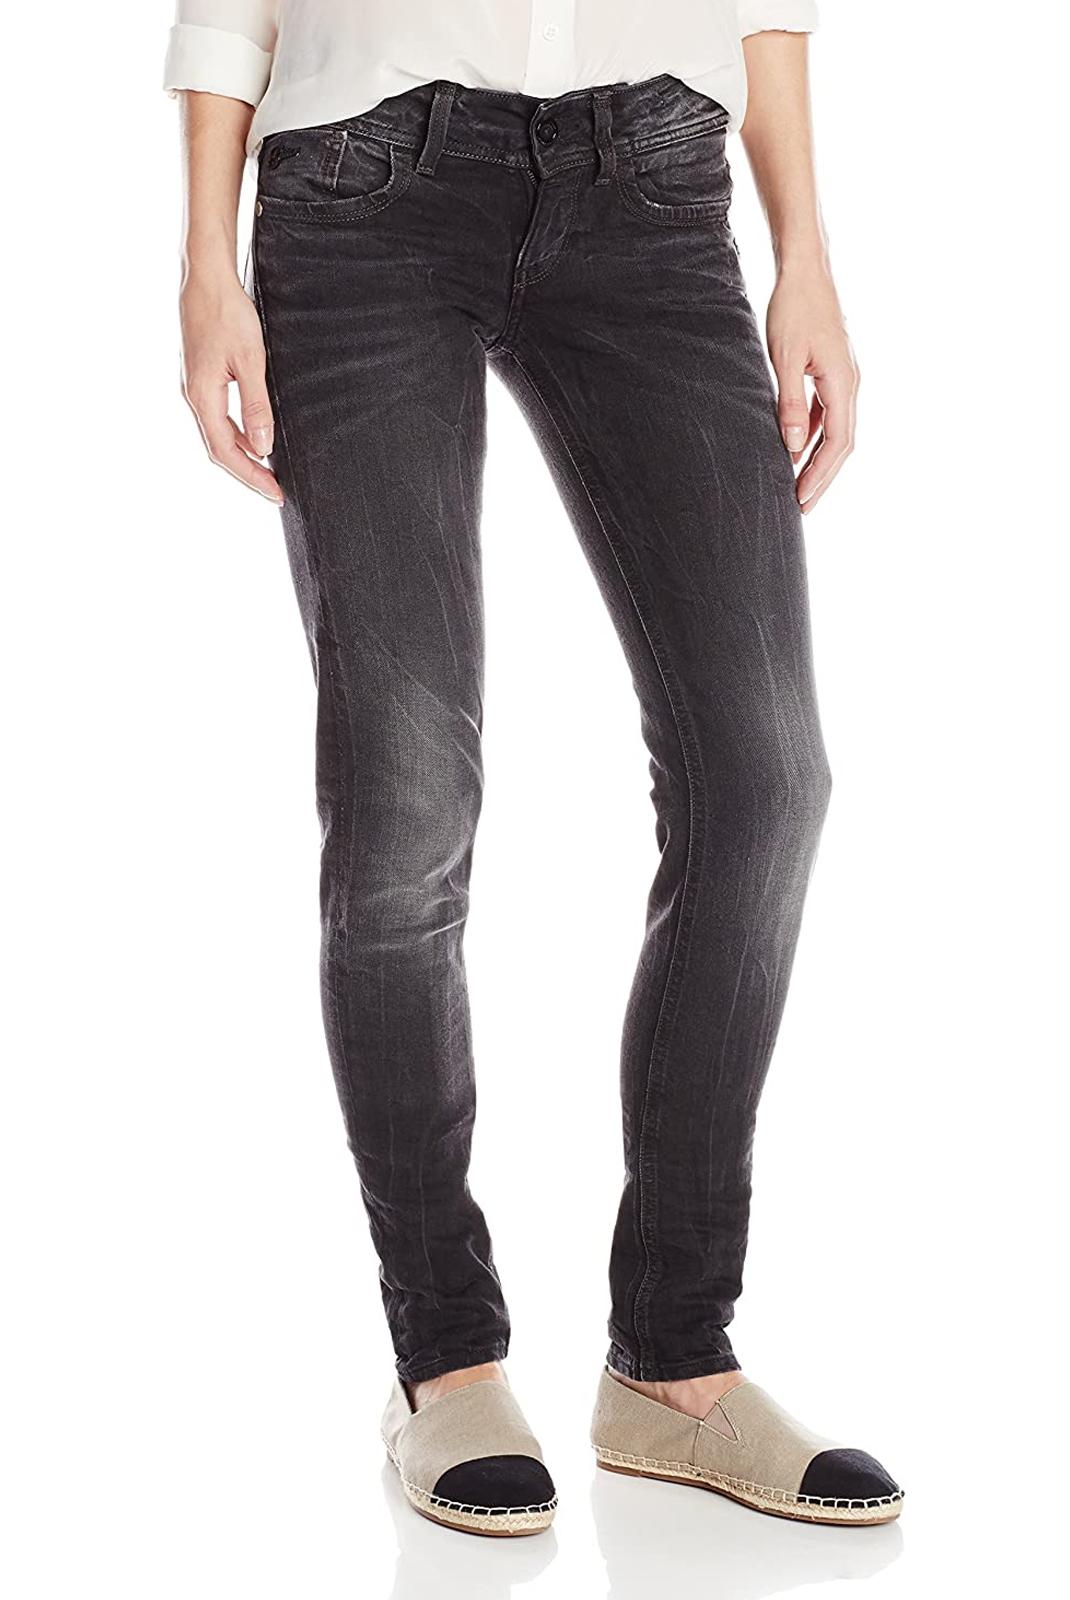 Jeans   G-star 60367.5758.89 NOIR